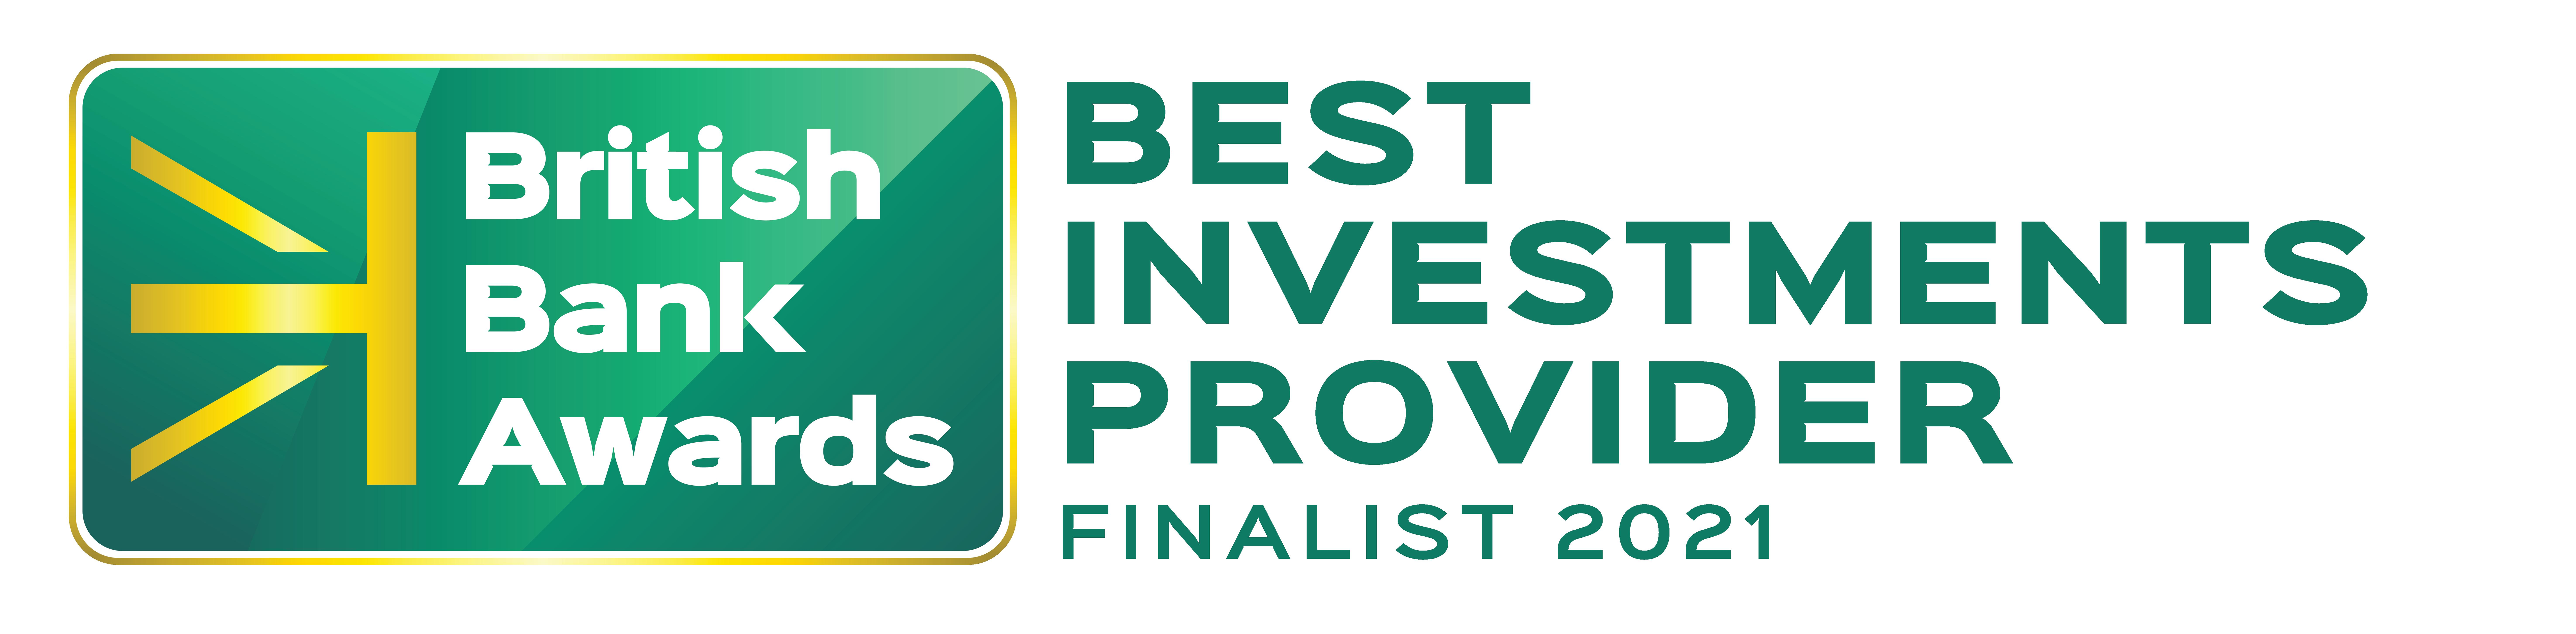 British Bank Awards 2021 - Best Investment Provider - Finalist